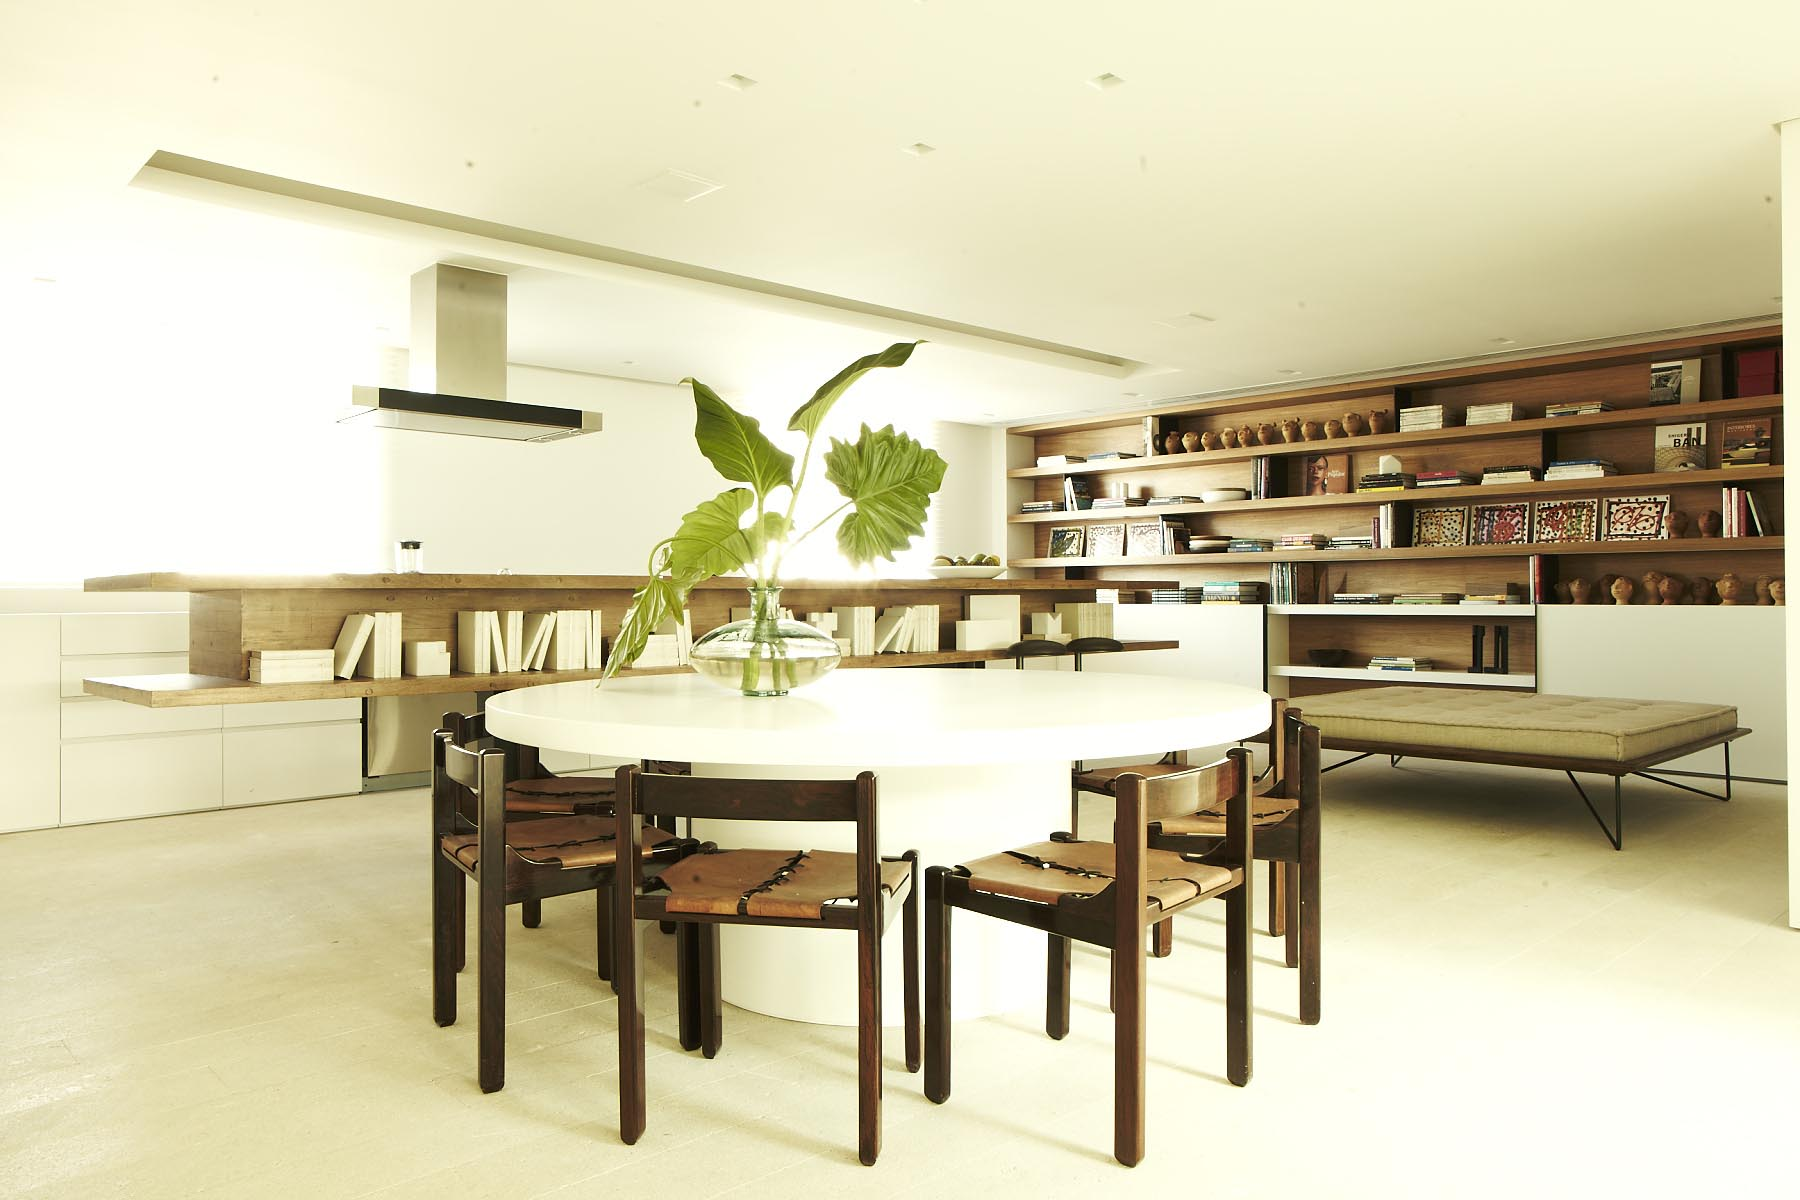 02-2012-os-apartamentos-vencedores-do-premio-casa-claudia-design-de-interiores